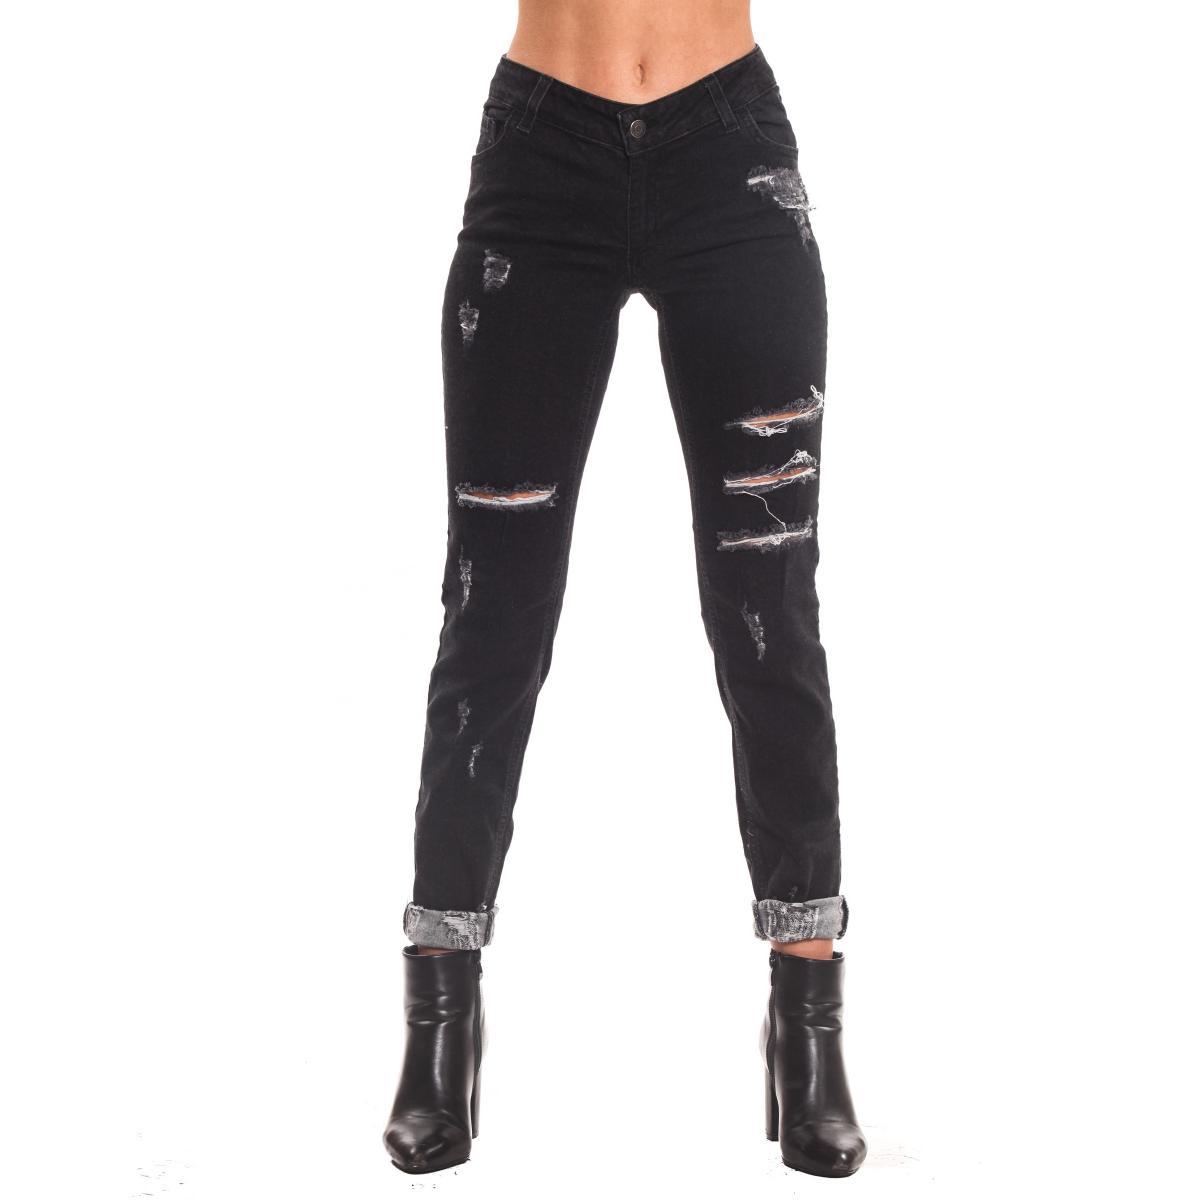 Pantaloni Jeans H.U.N.T. Skinny fit strappato nero da donna rif. HDC801